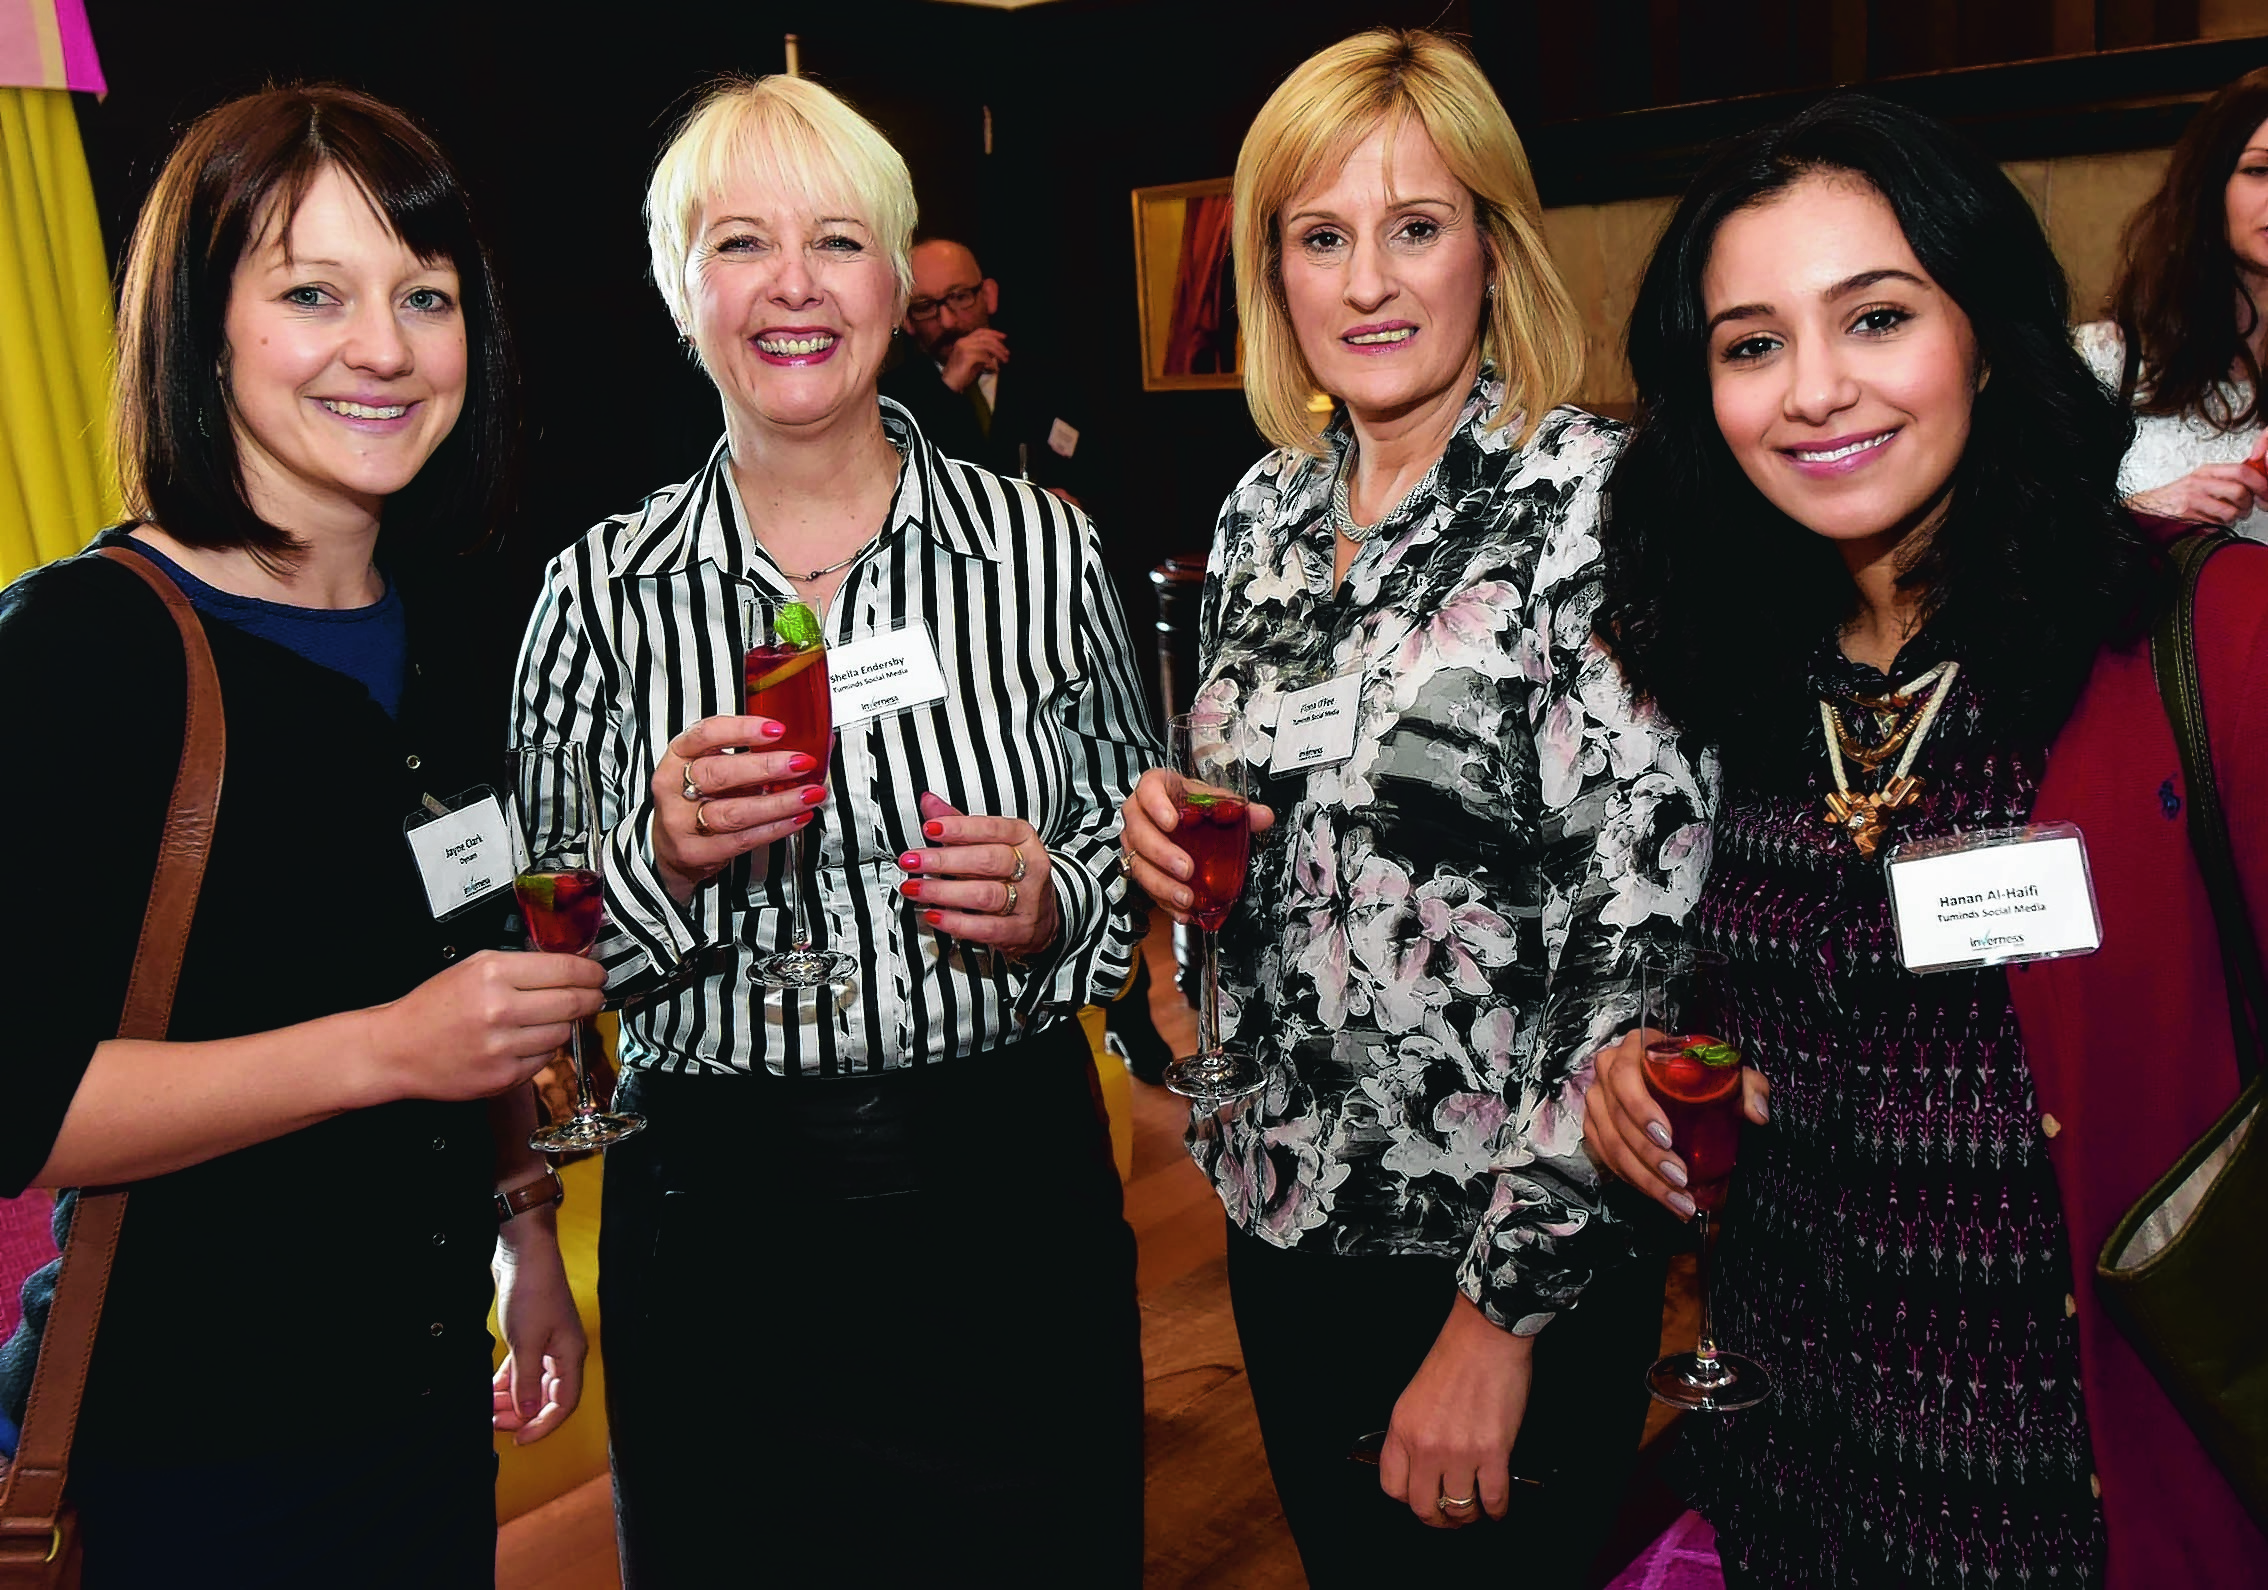 Jayne Clark, Sheila Eldersby, Fiona O'Fee and Hanan Al-Haifi.